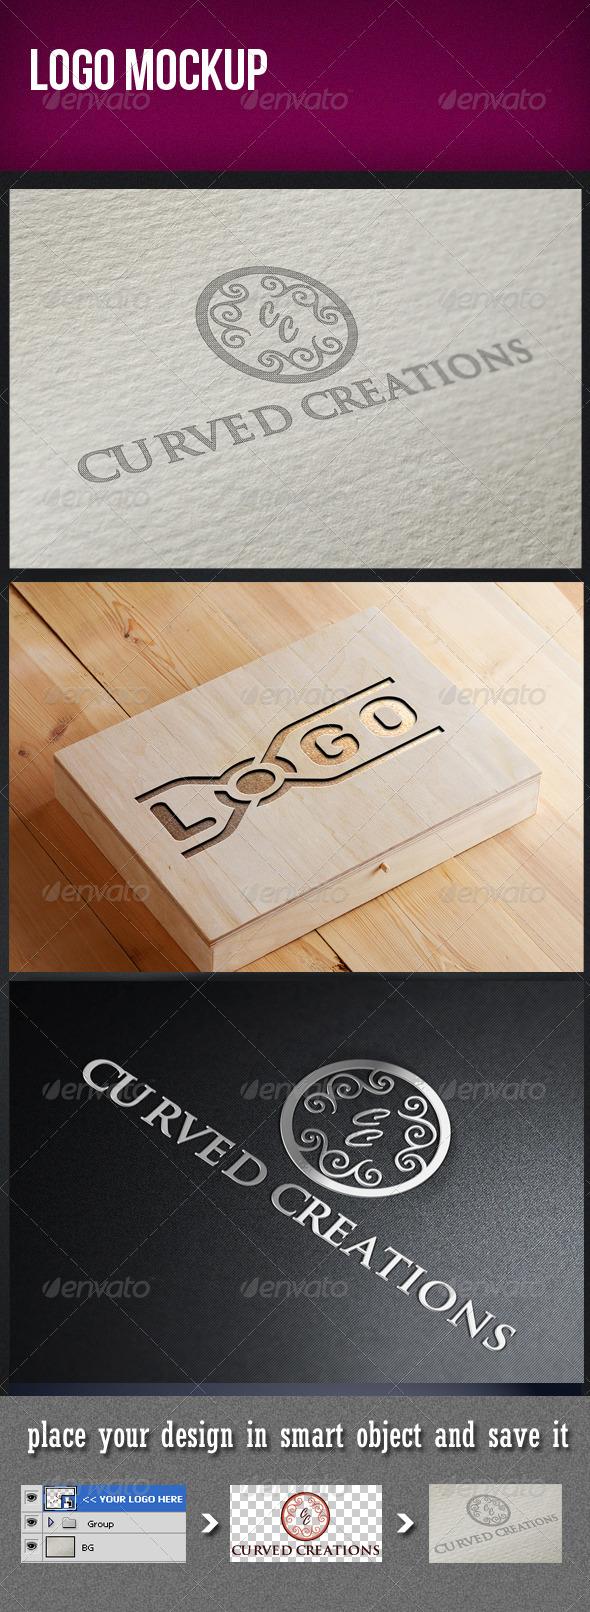 GraphicRiver Logo Mockup 3291878